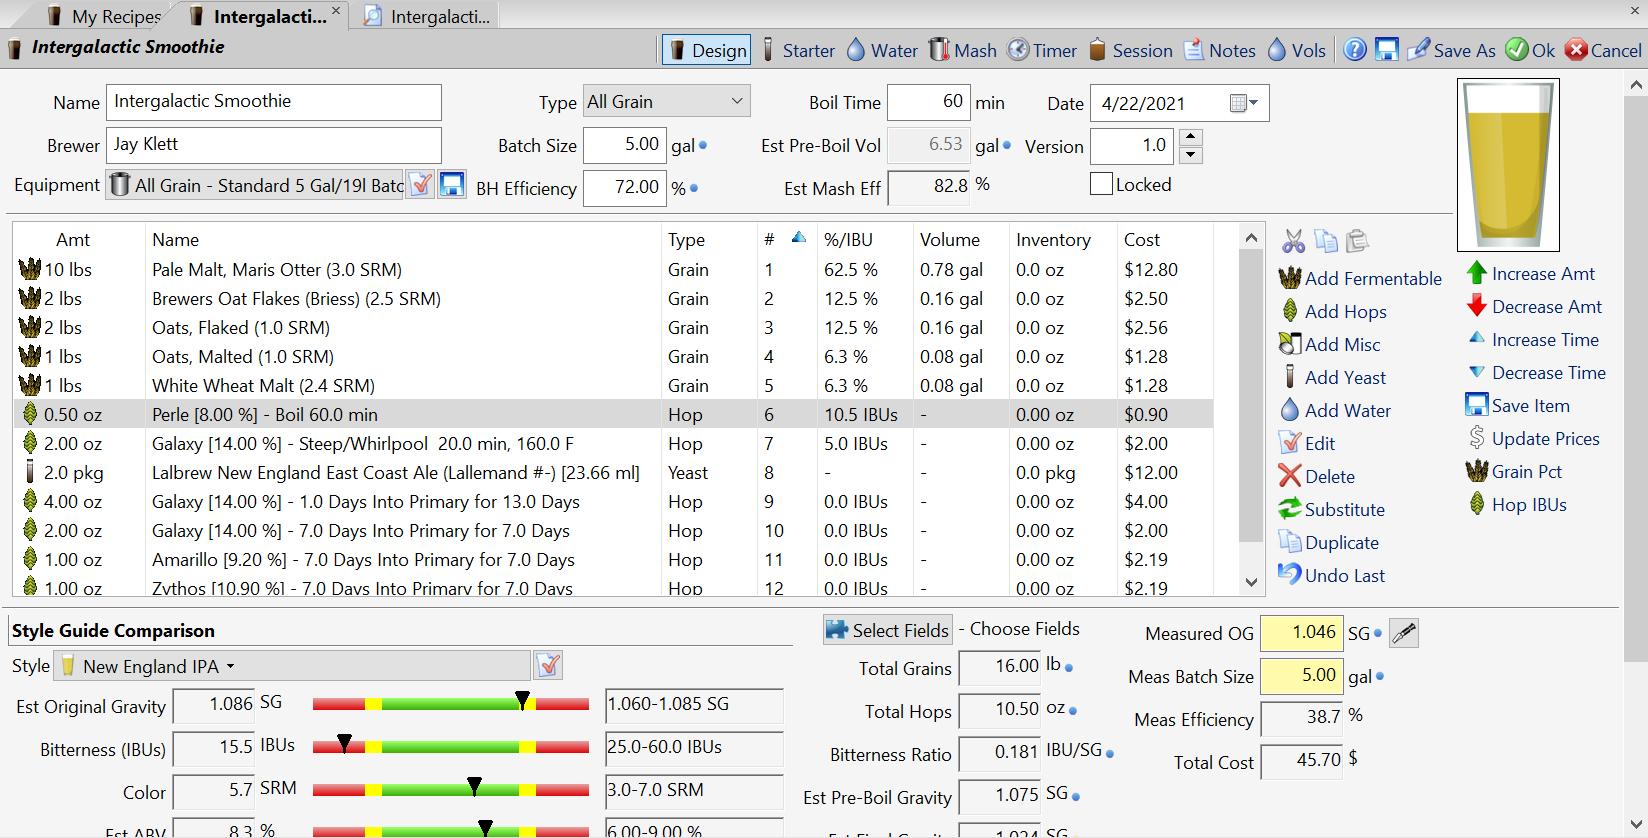 Screenshot 2021-04-22 110022.png